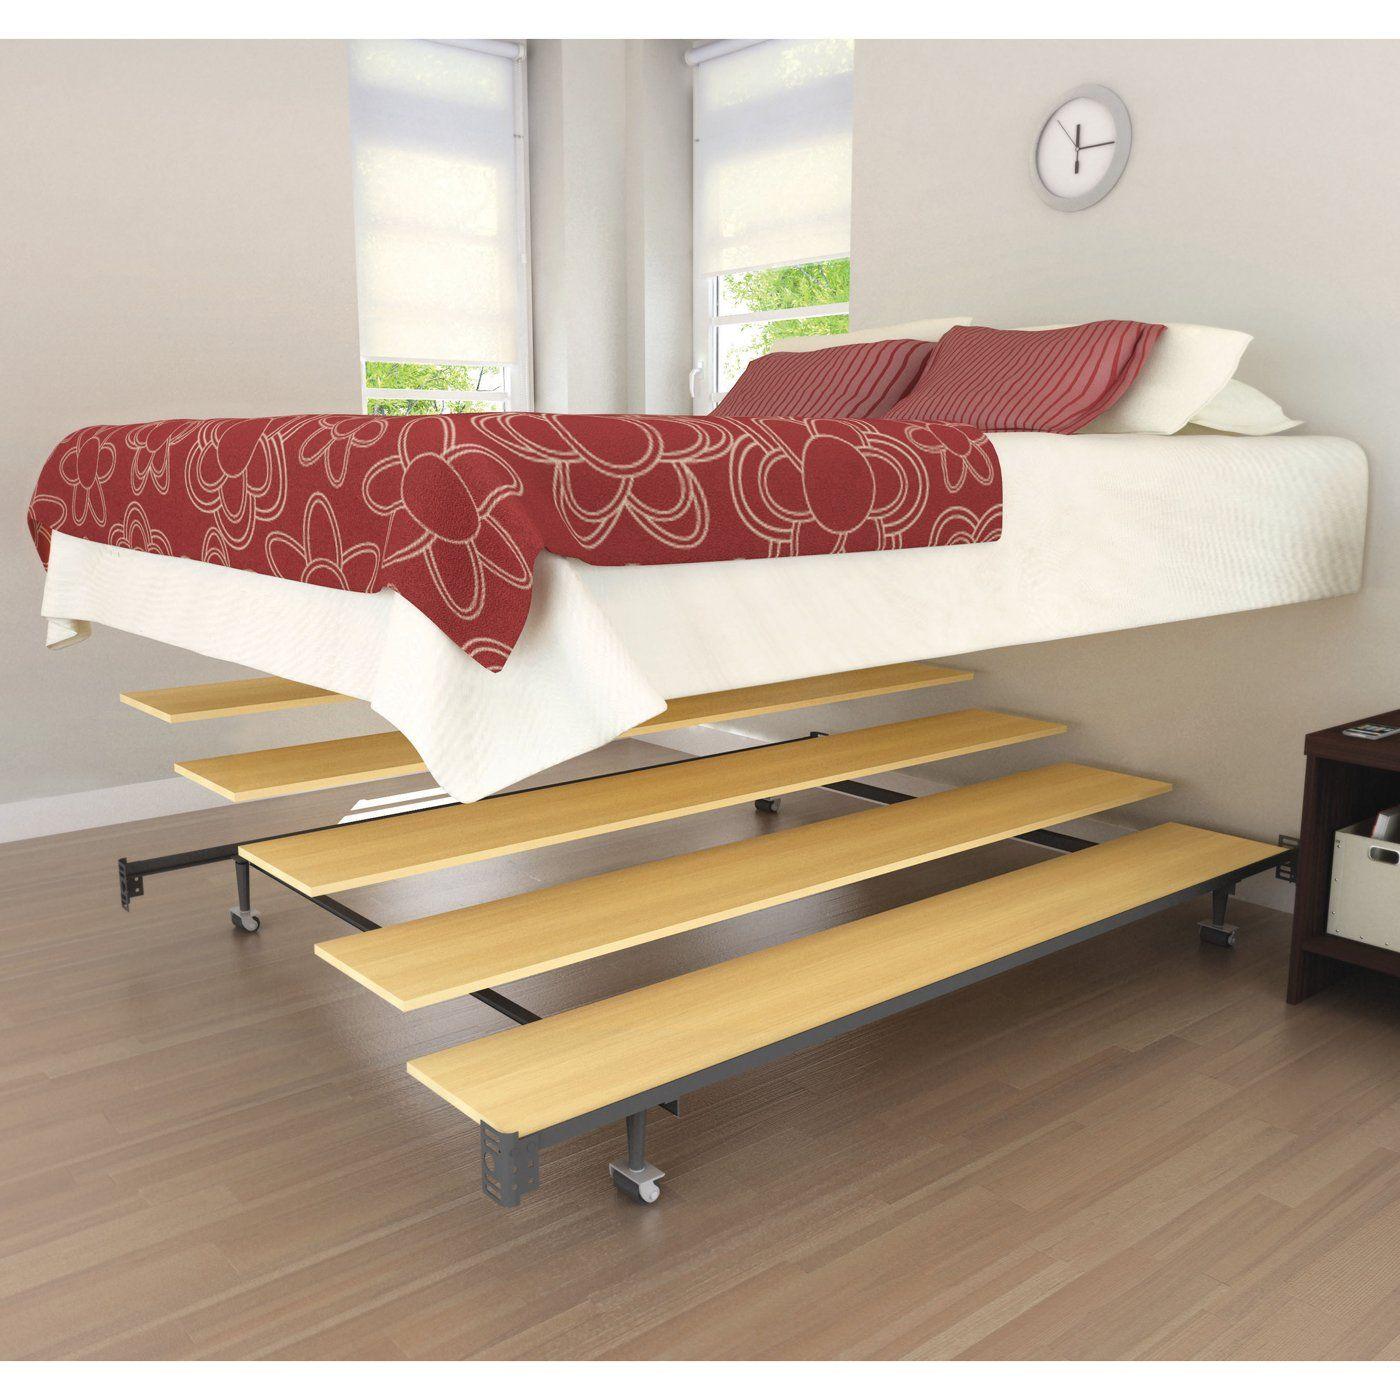 Cool Amazing Queen Bed And Mattress Set 54 In Small Home Decor Inspiration With Full Mattressmattress Framemattress